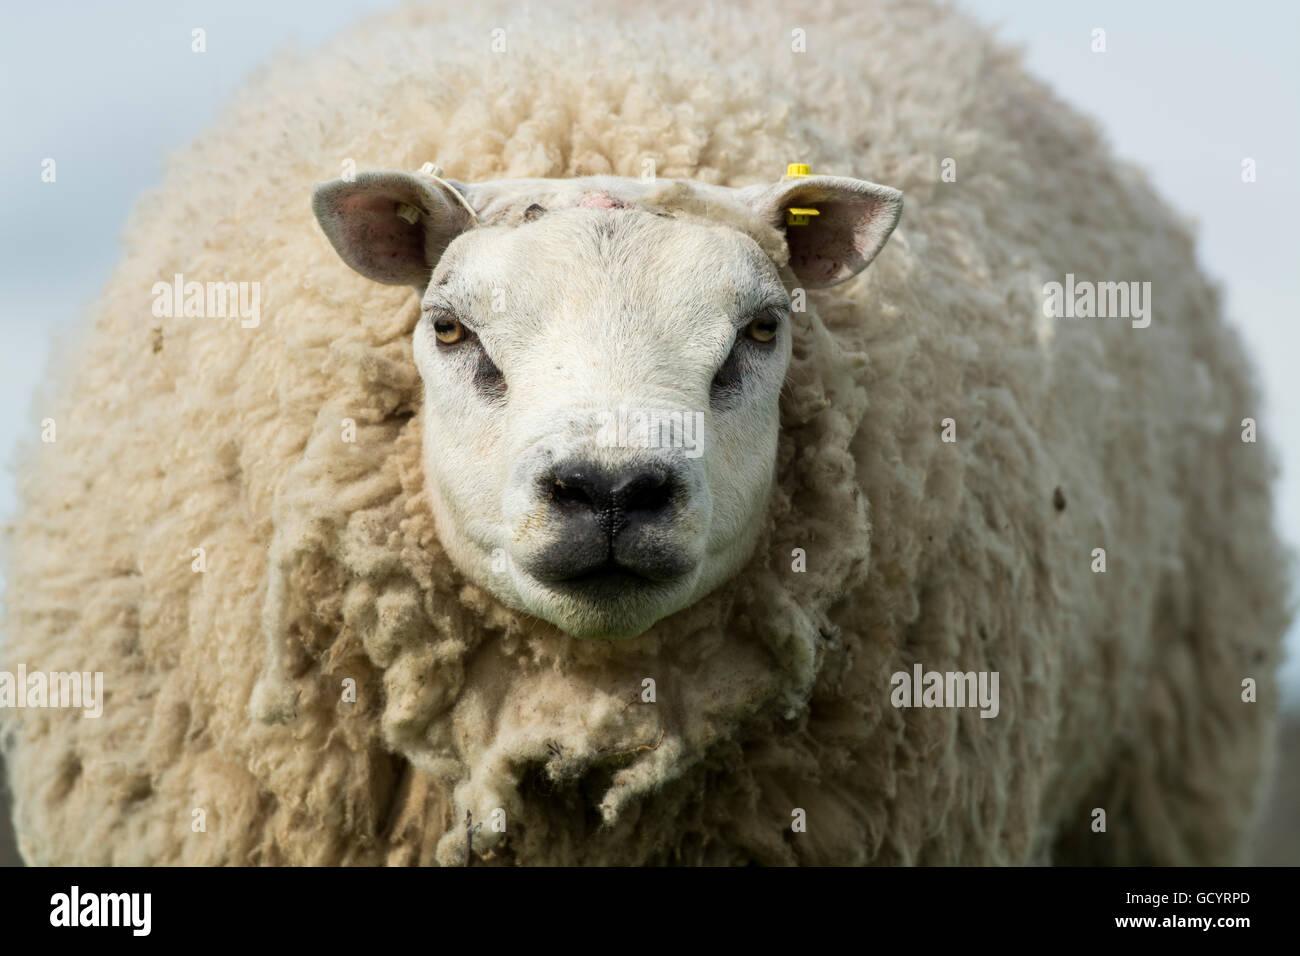 Head of a Beltex ram, in full wool. Lancashire, UK. - Stock Image